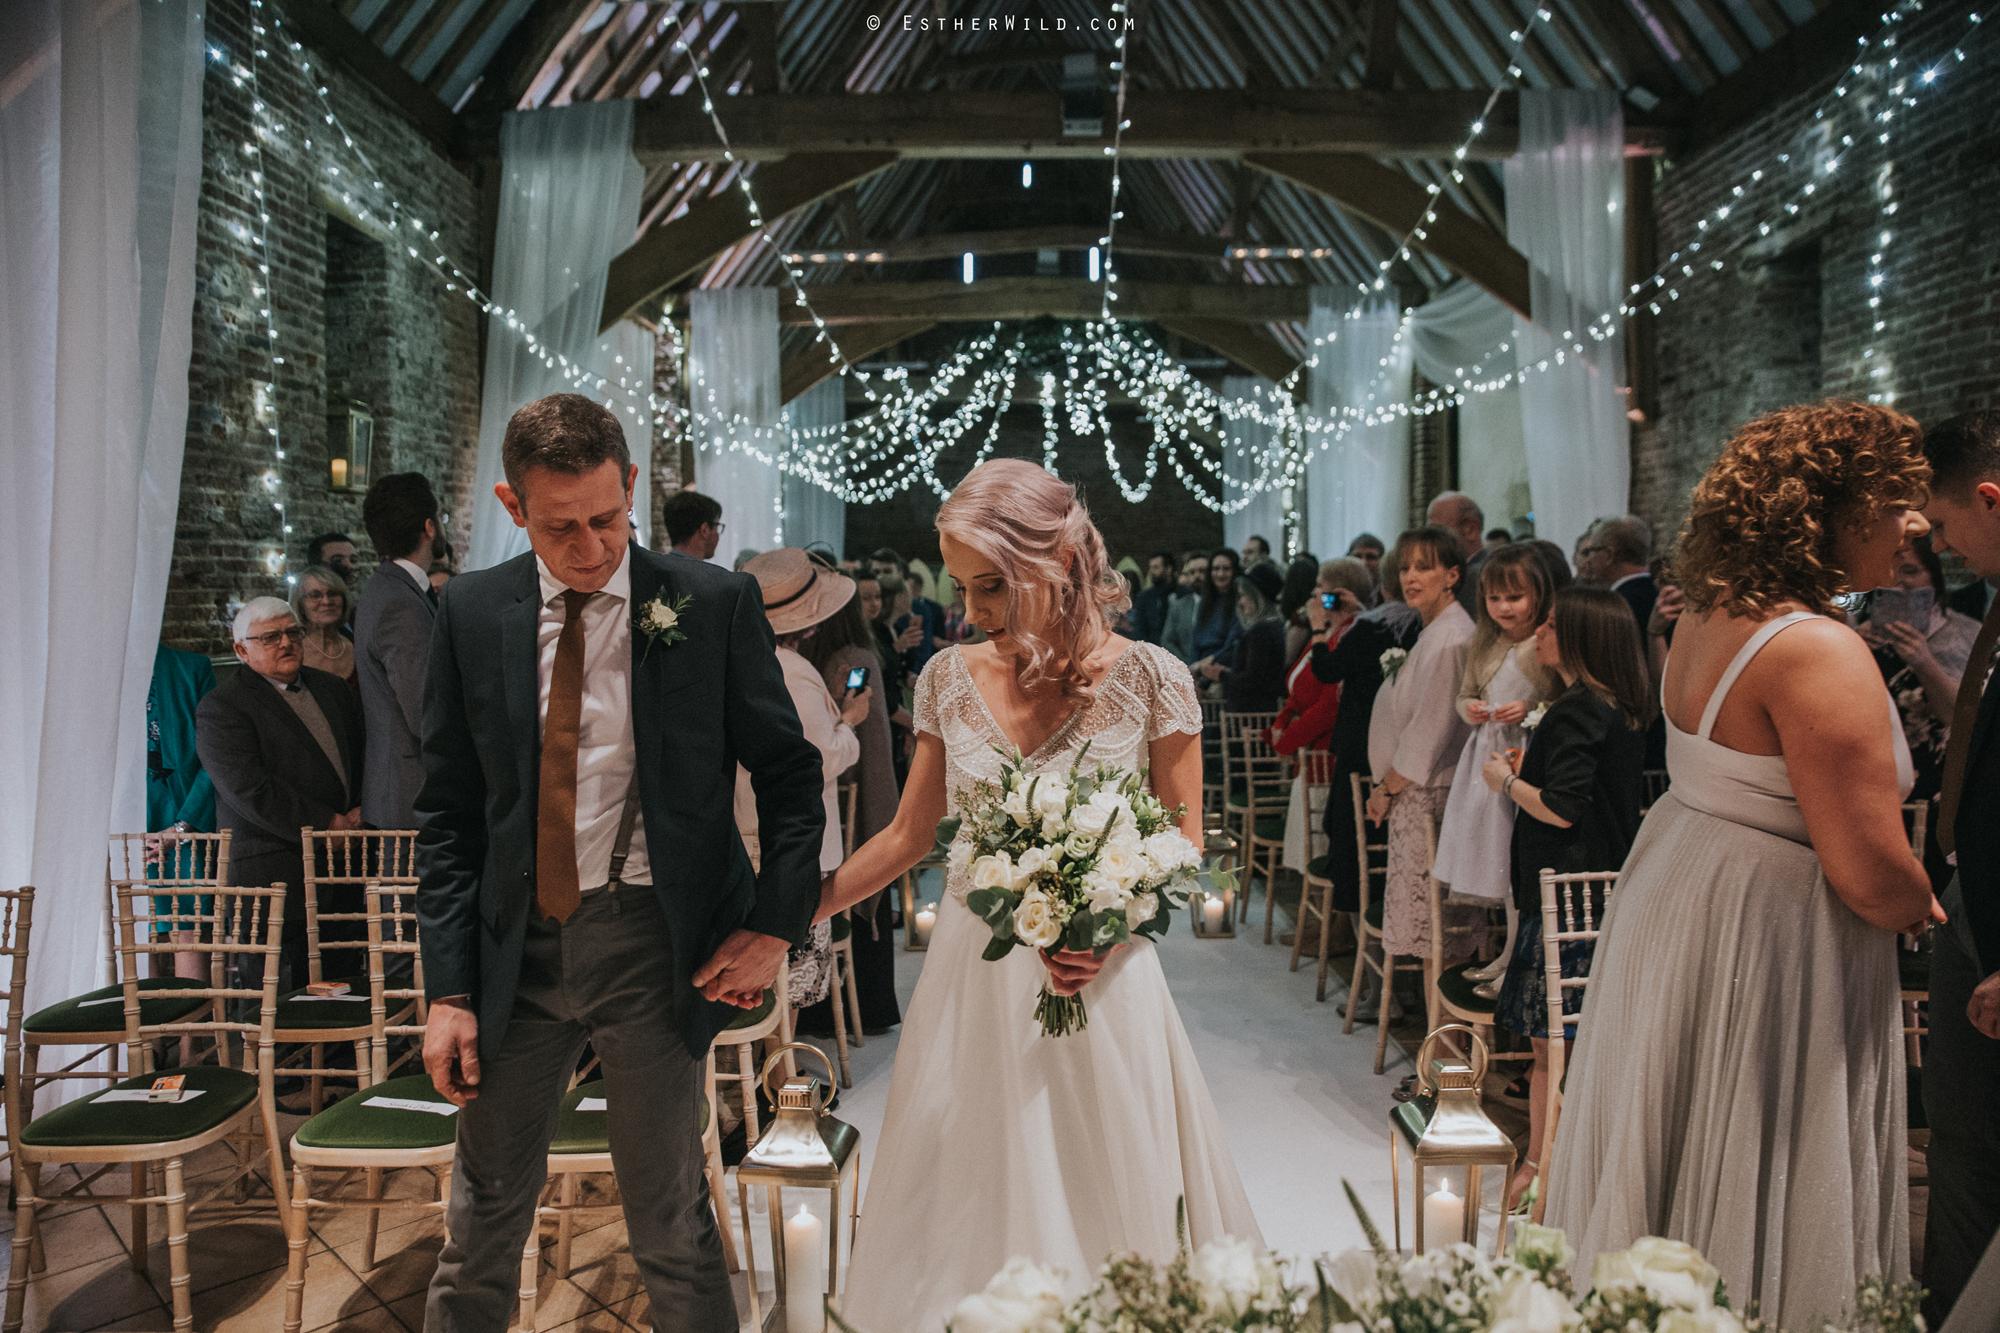 Elms_Barn_Weddings_Suffolk_Photographer_Copyright_Esther_Wild_IMG_1069.jpg